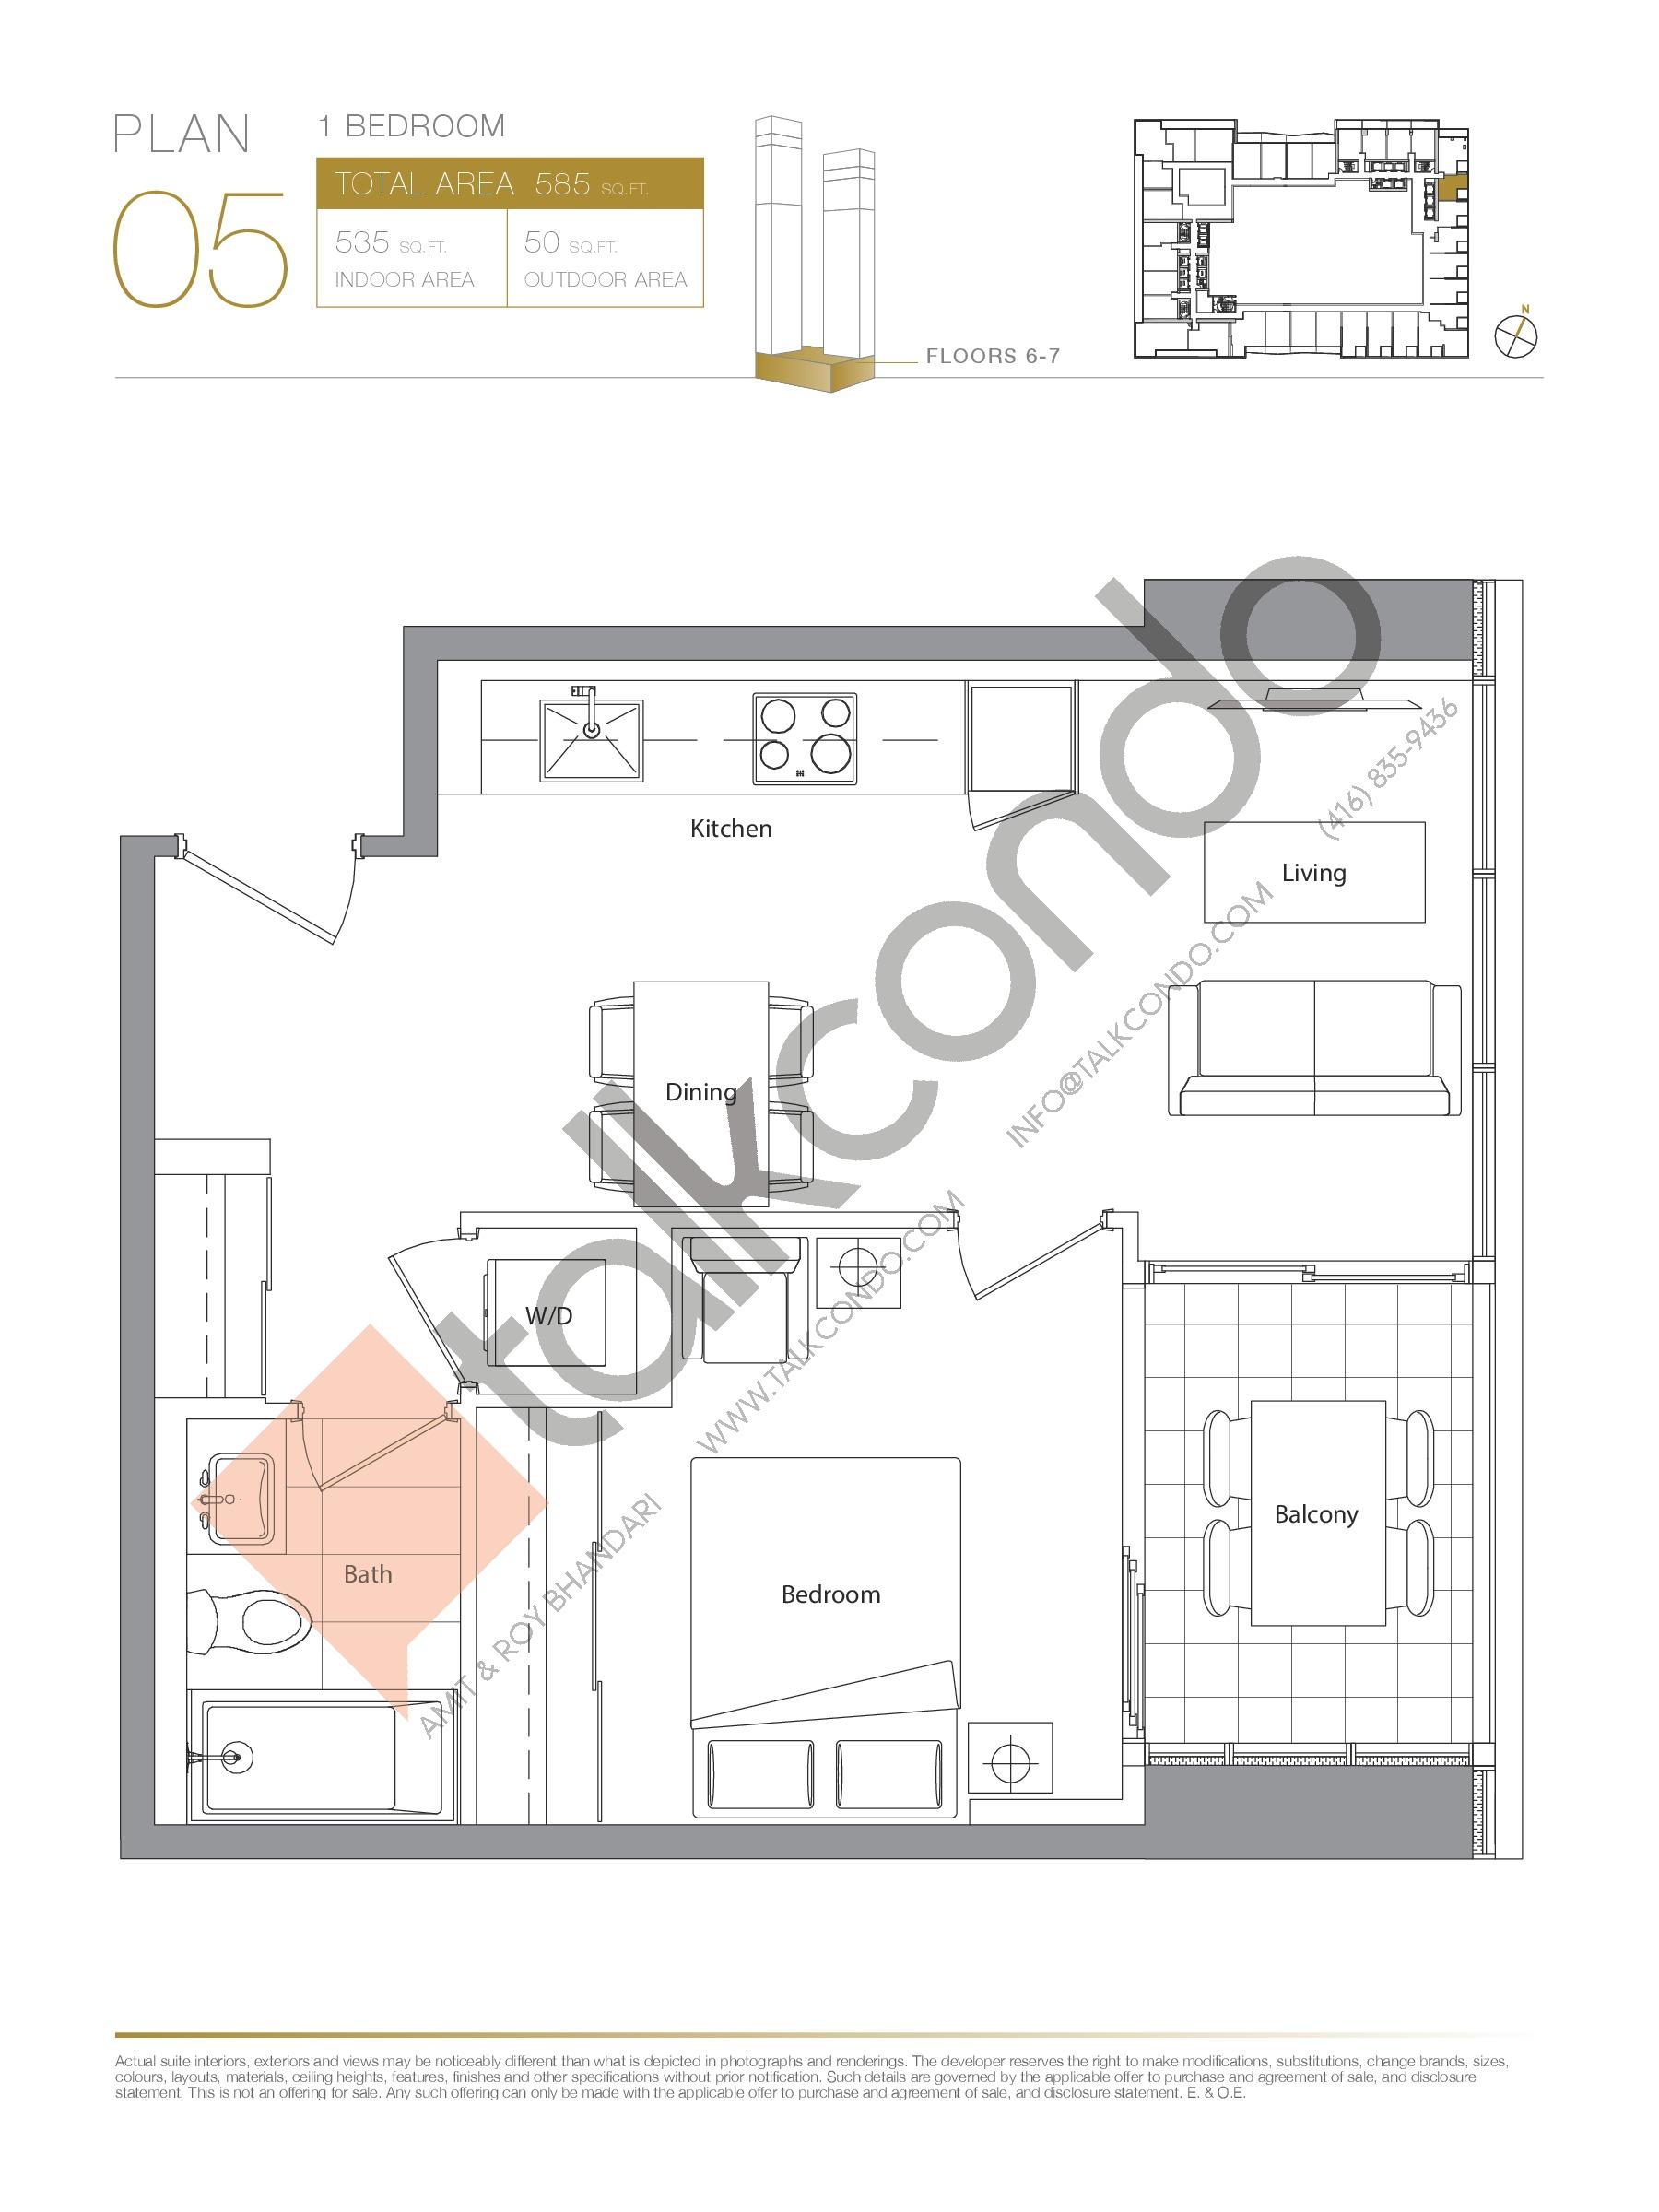 Plan 05 - Podium Floor Plan at Concord Canada House Condos - 535 sq.ft